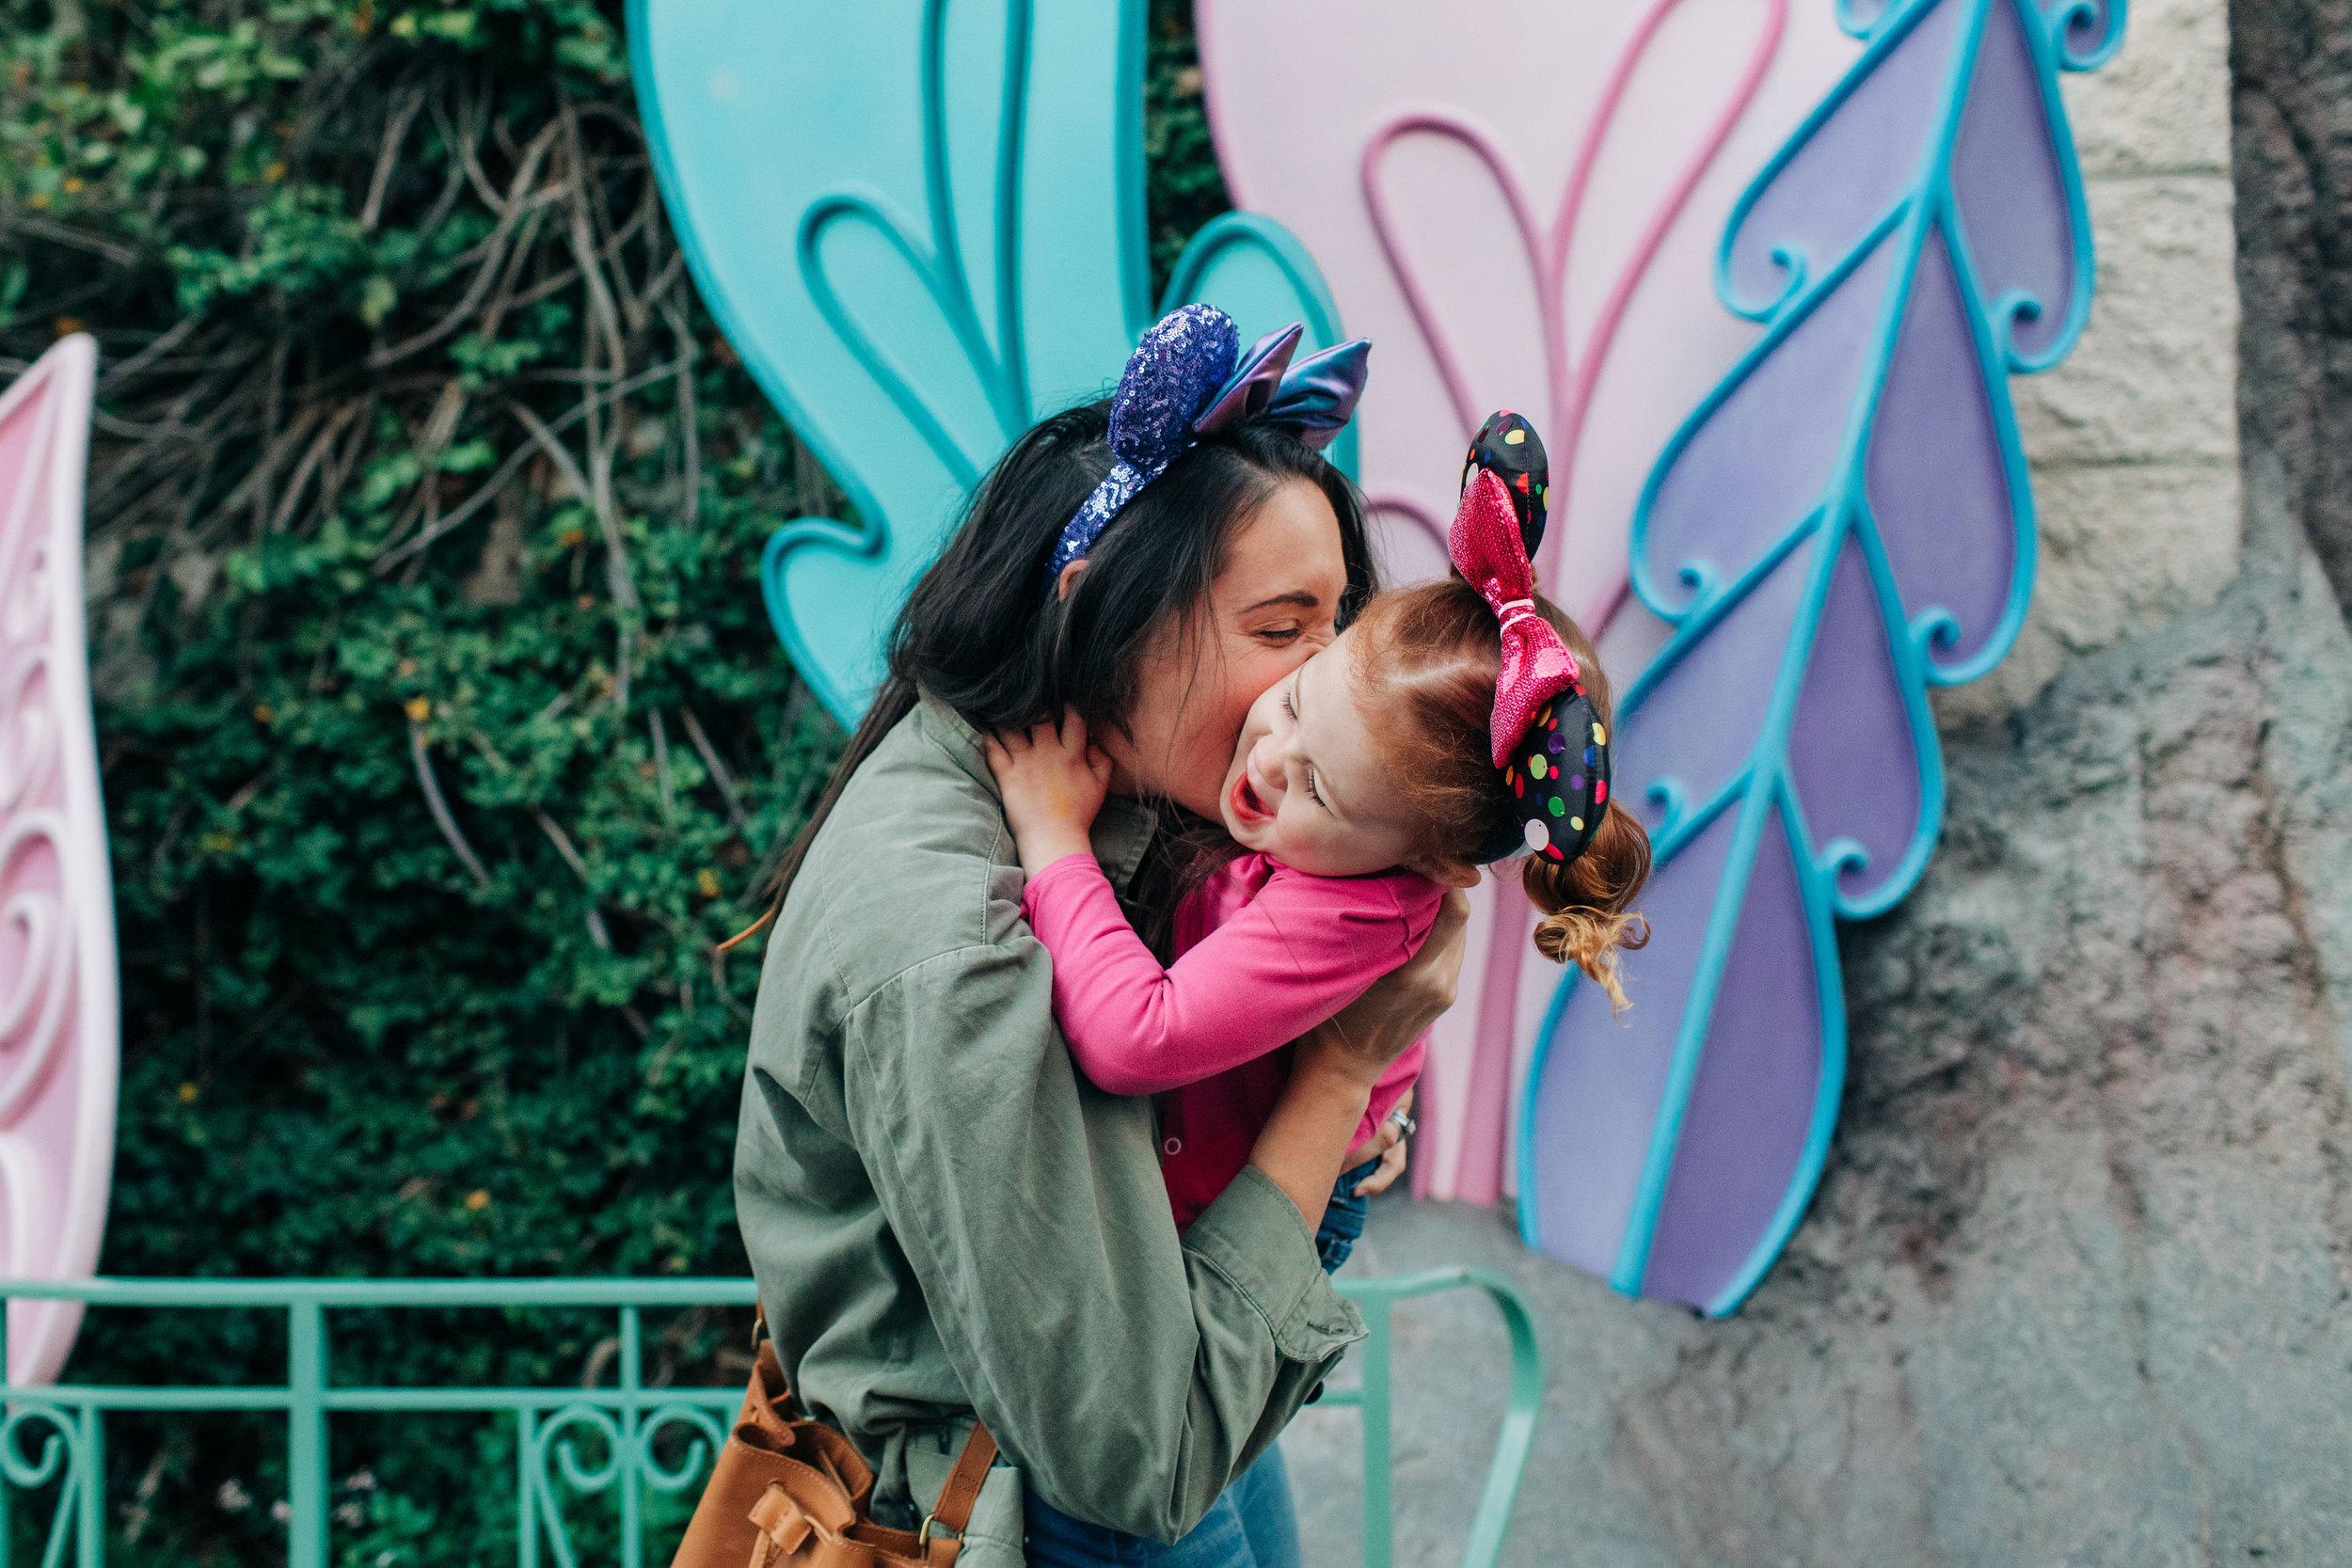 Baby_Boy_Bakery_Disneyland_LilyRoPhotography-7487.jpg